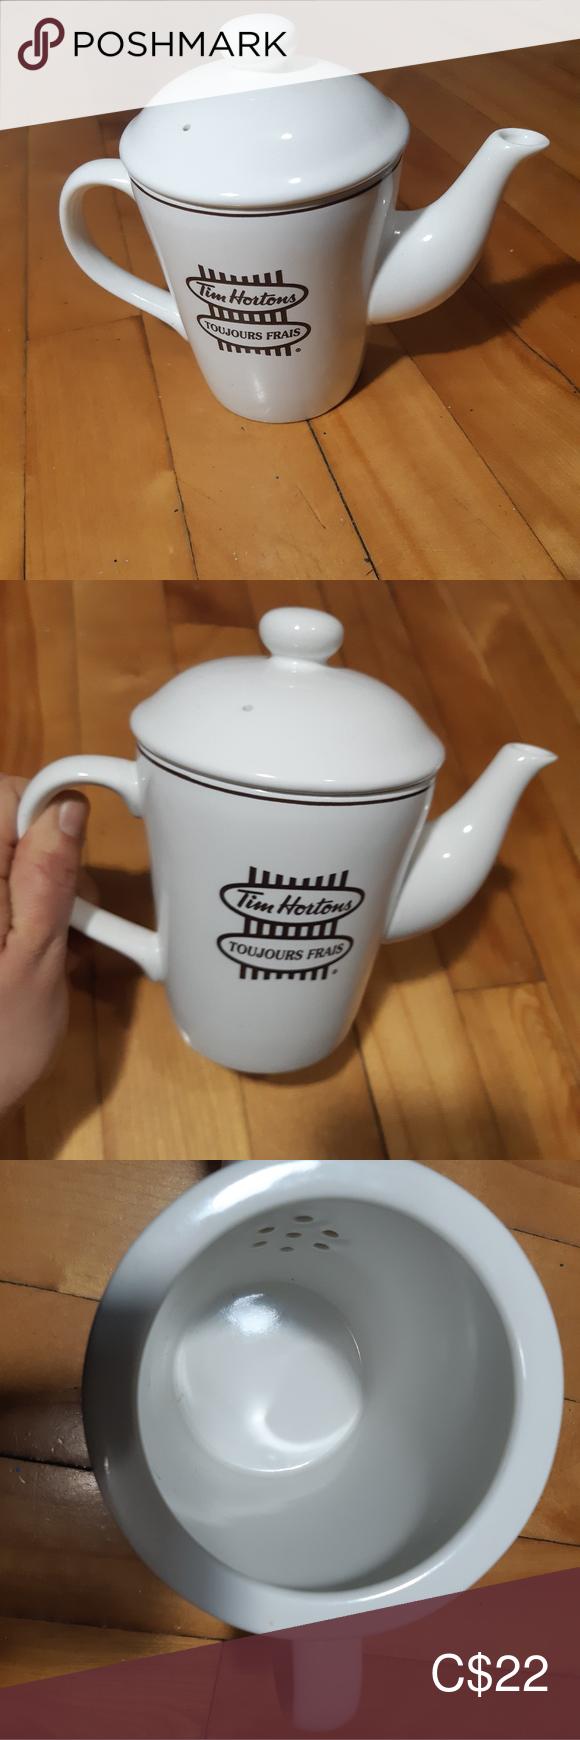 Tim Hortons teapot in 2020 Tea accessories, Tea pots